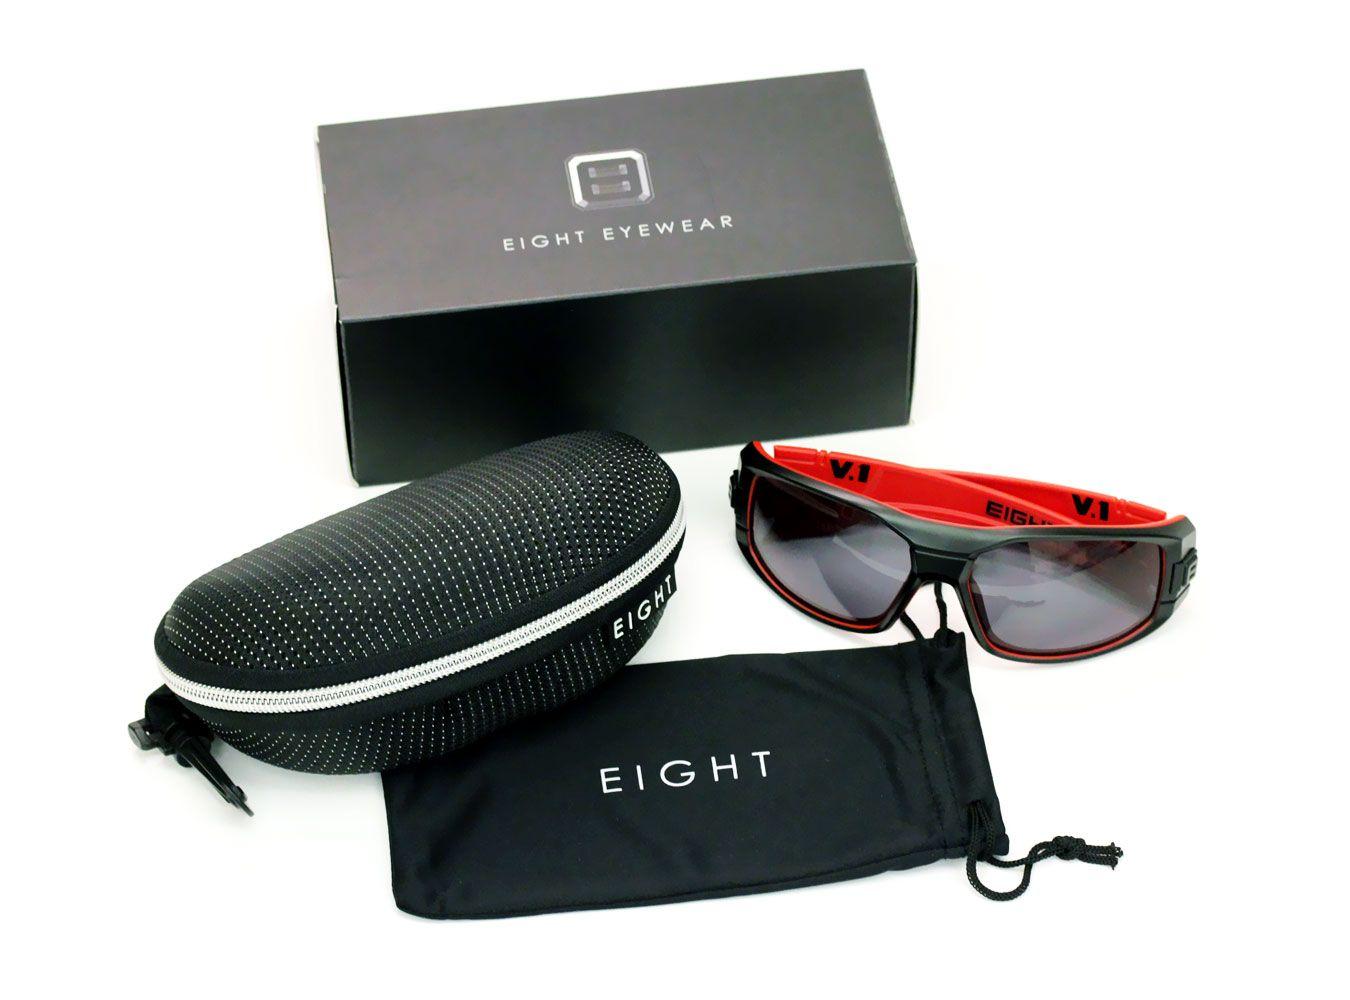 9a063ca7d85 Matte Black   Red V.1 sunglasses from EIGHT Eyewear WWW.IWEAR8.COM   8eyewear  sunglasses  shades  cool  mensfashion  fashion  style  summer   eight  sports   ...